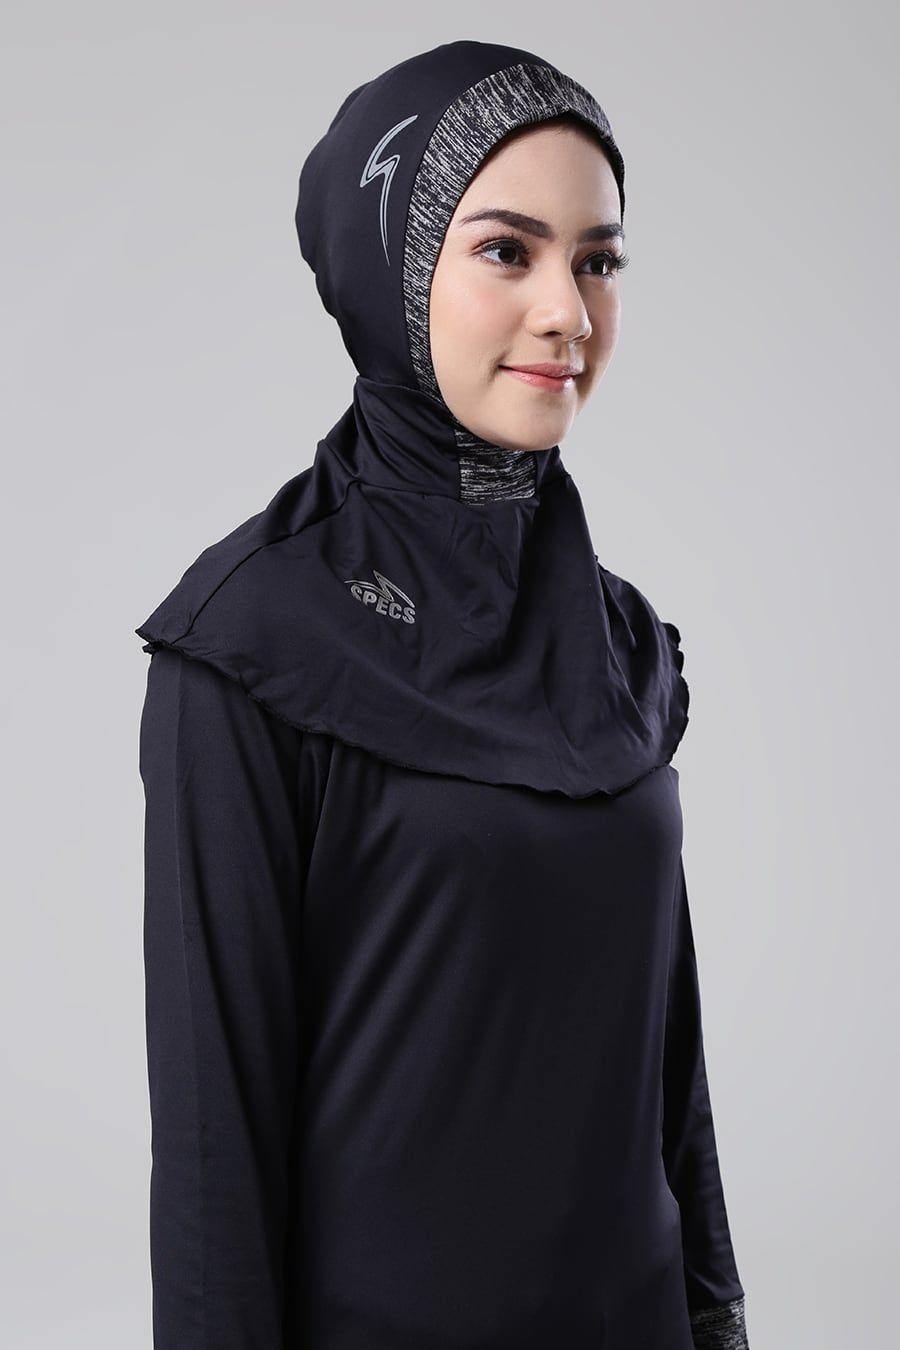 Esorra Hijab Cap W Specs Active Hijab Sport Hijup Gaya Model Pakaian Model Pakaian Kerudung